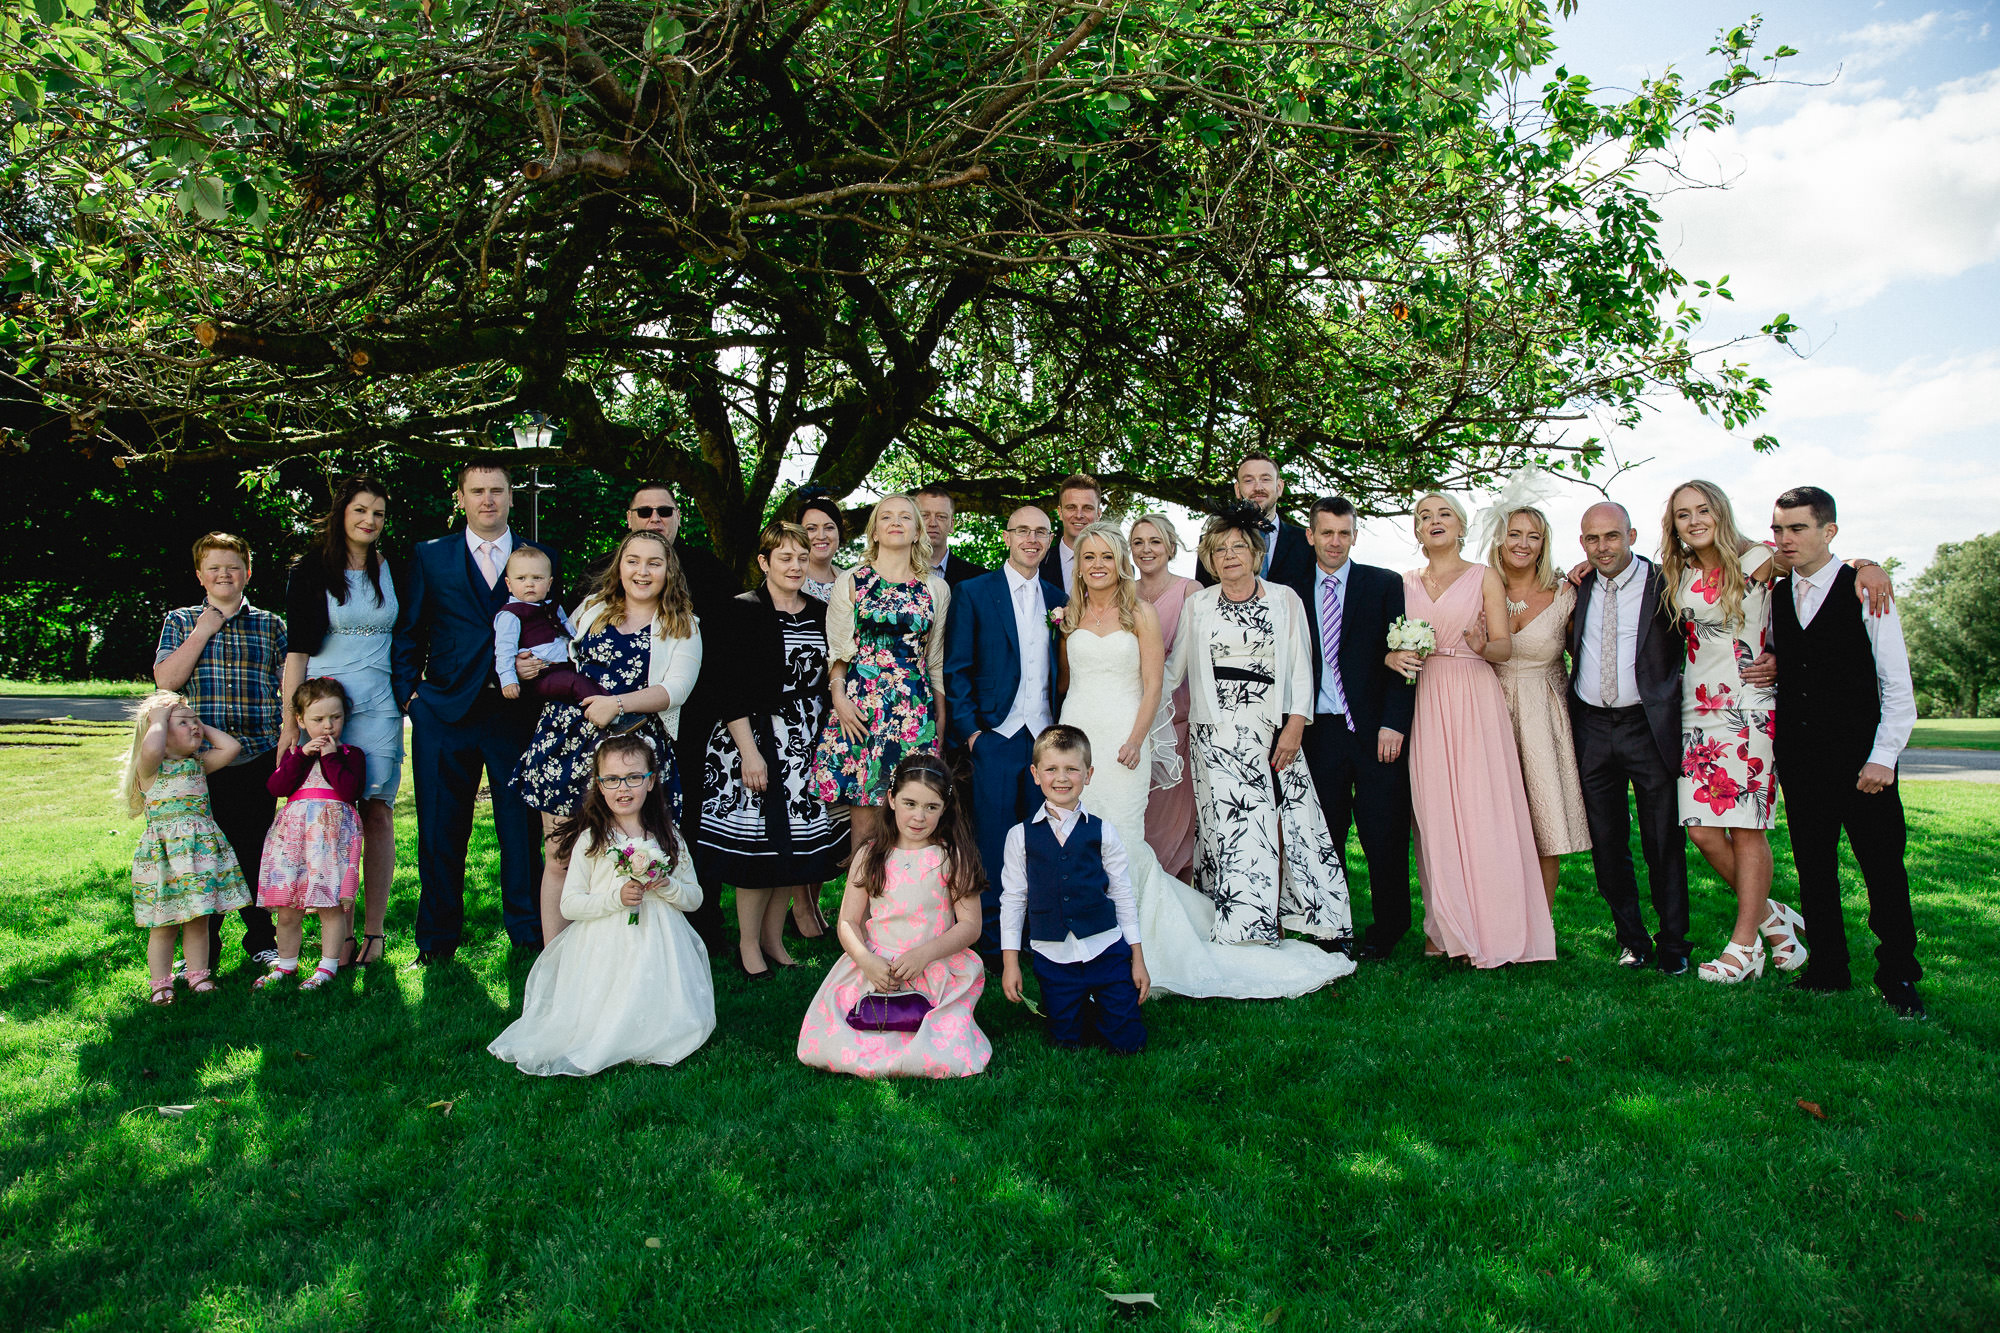 CLAIREBYRNEPHOTOGRAPHY-WEDDING-Ireland-tulffaris-alternative-fun-Lisa-terry-24.jpg